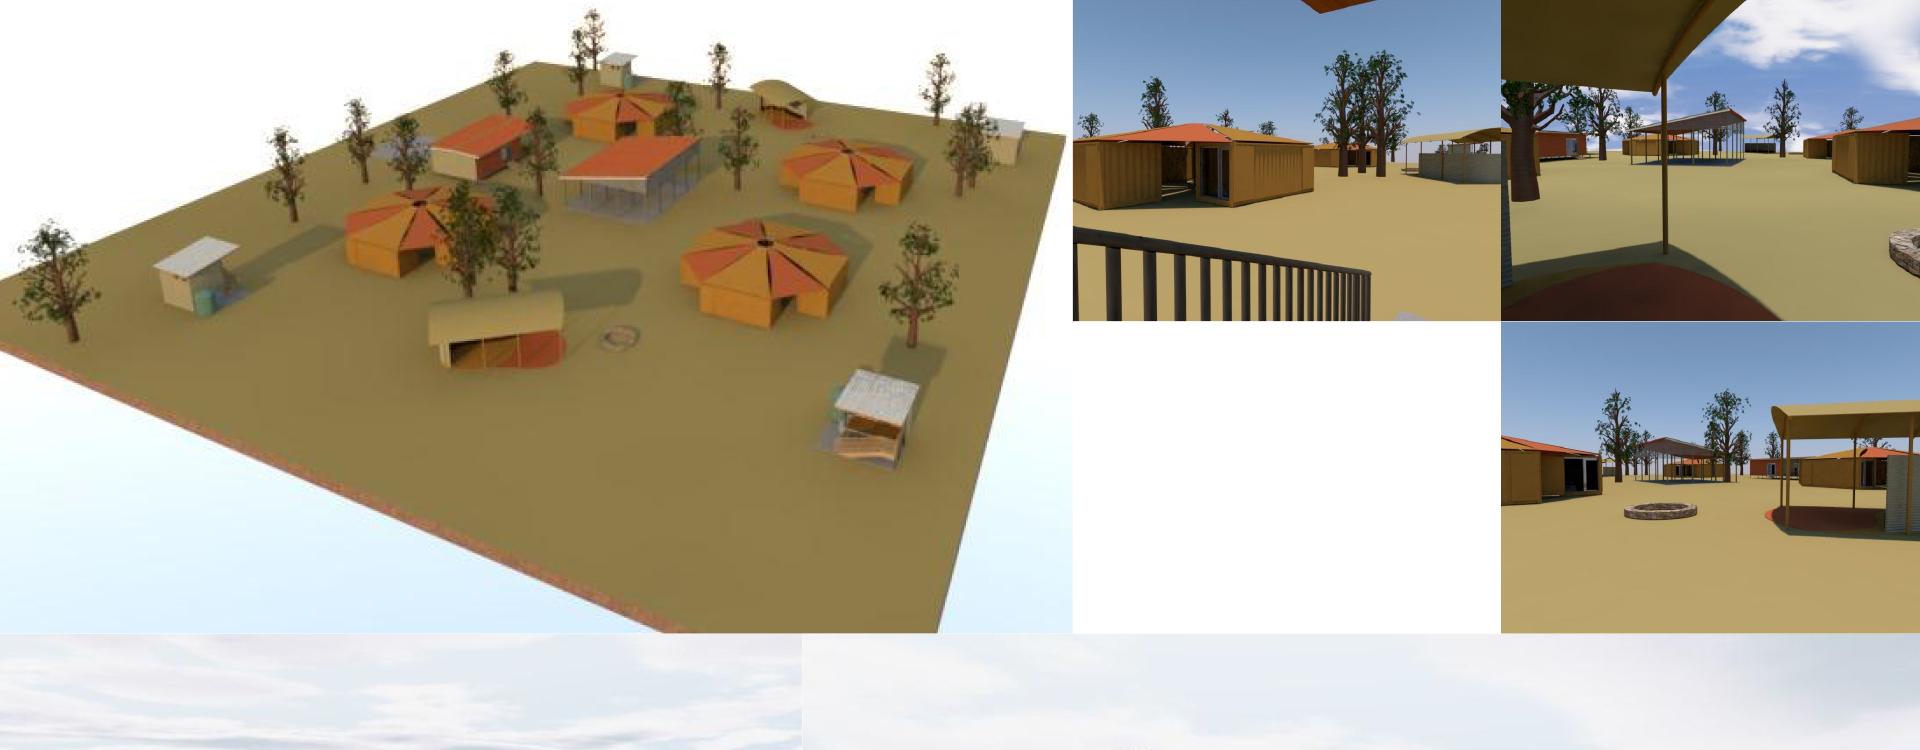 Rehabilitation Camp